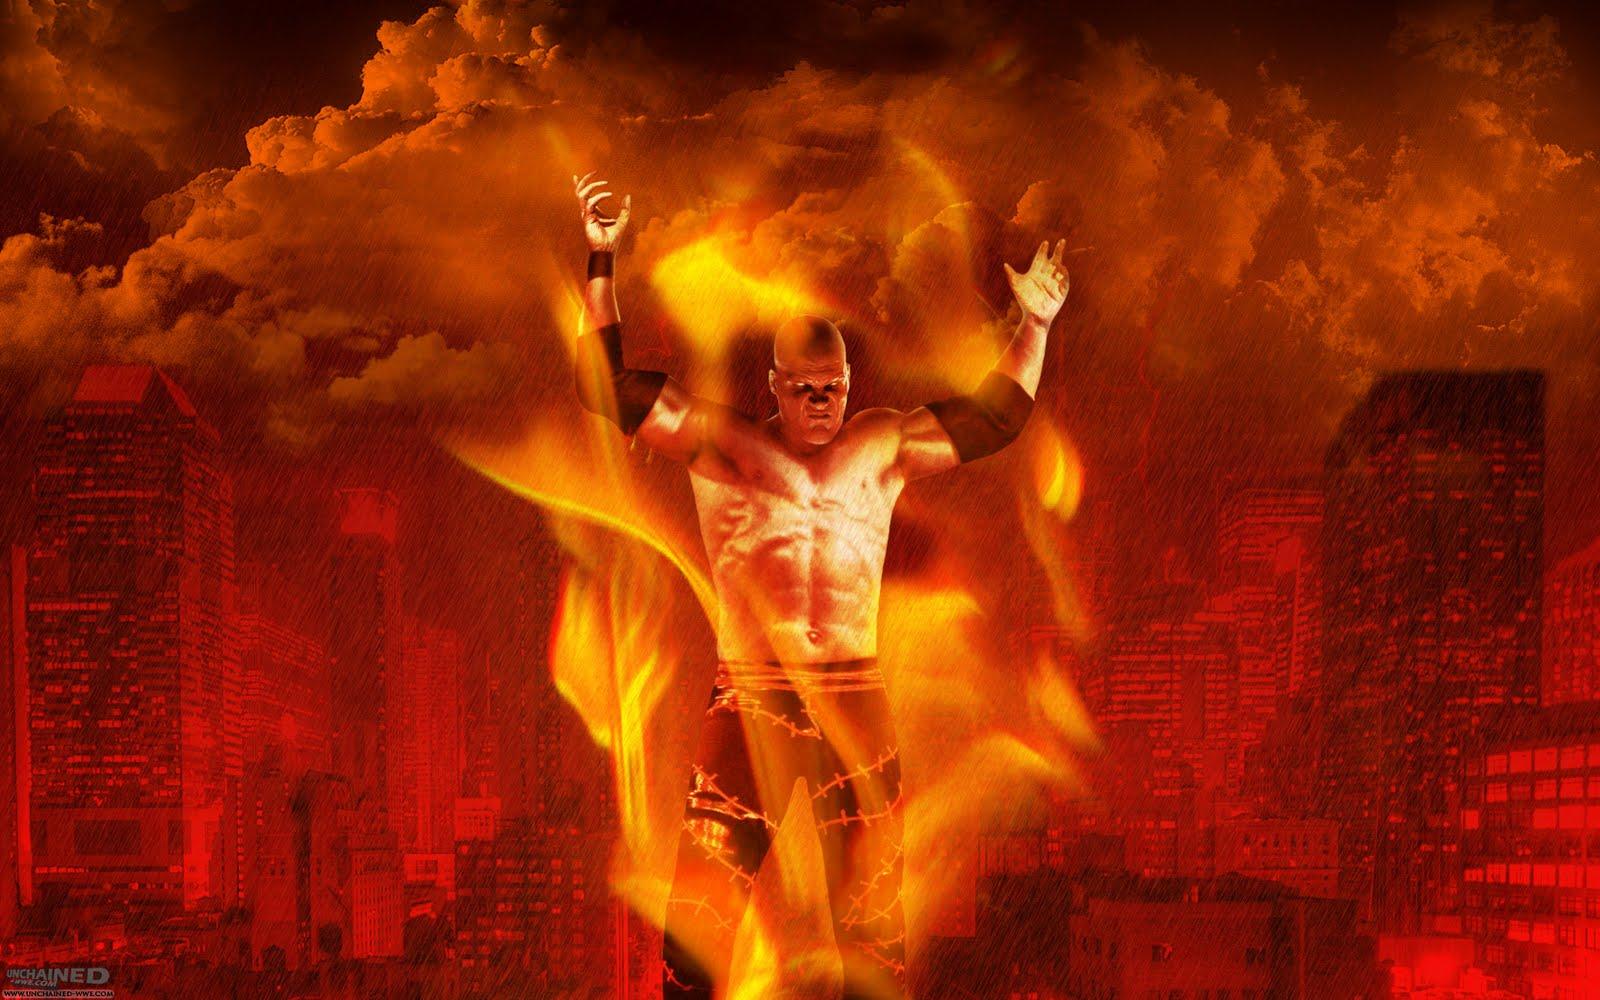 The Undertaker 3d Wallpaper Wwe Superstars Wwe Wallpapers Wwe Wrestlemania Wwe